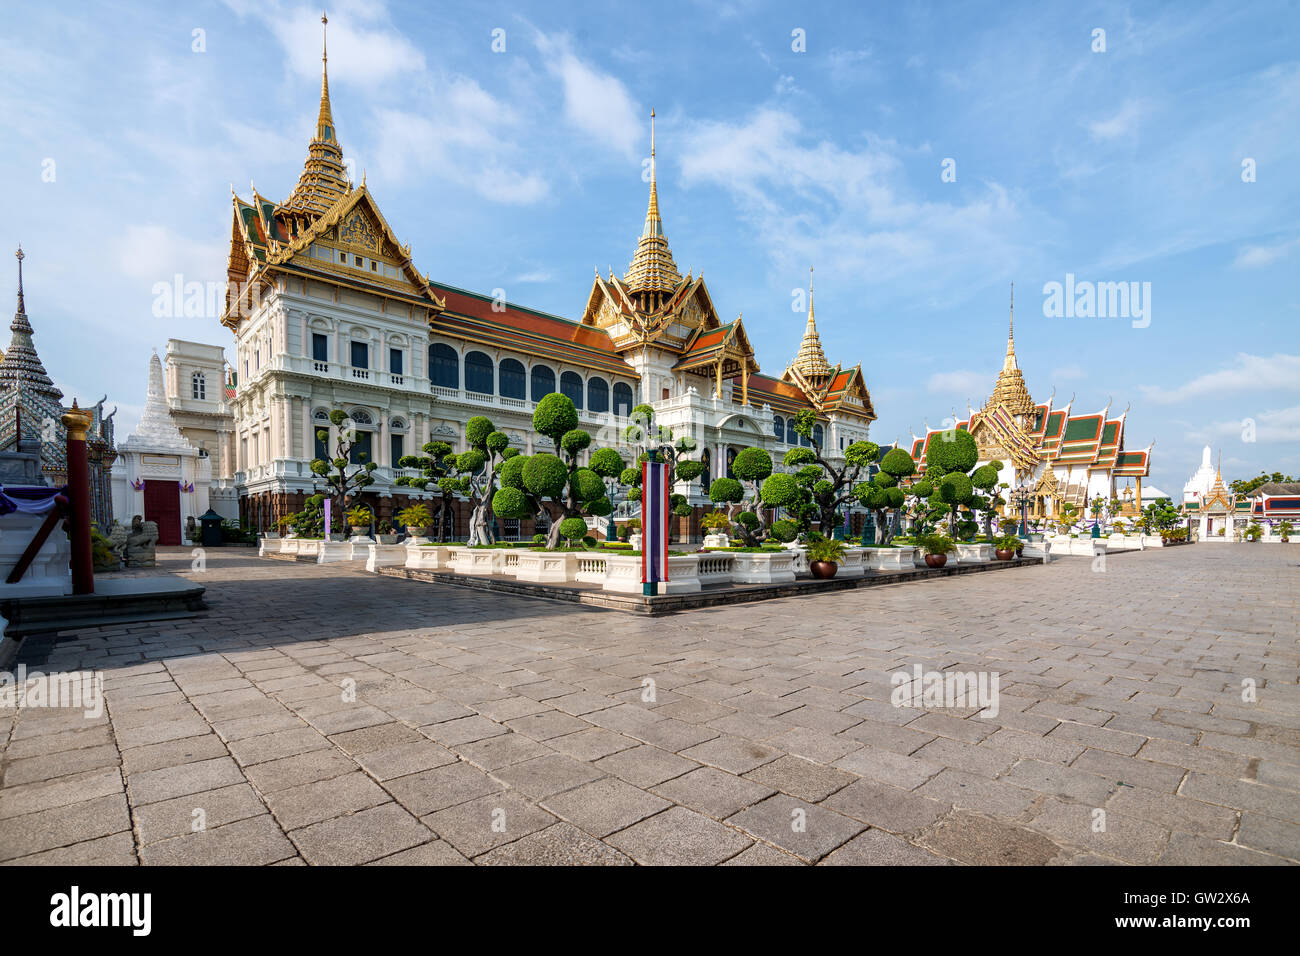 Grand palais royal de la Thaïlande avec ciel de Nice à Bangkok, Thaïlande. Photo Stock